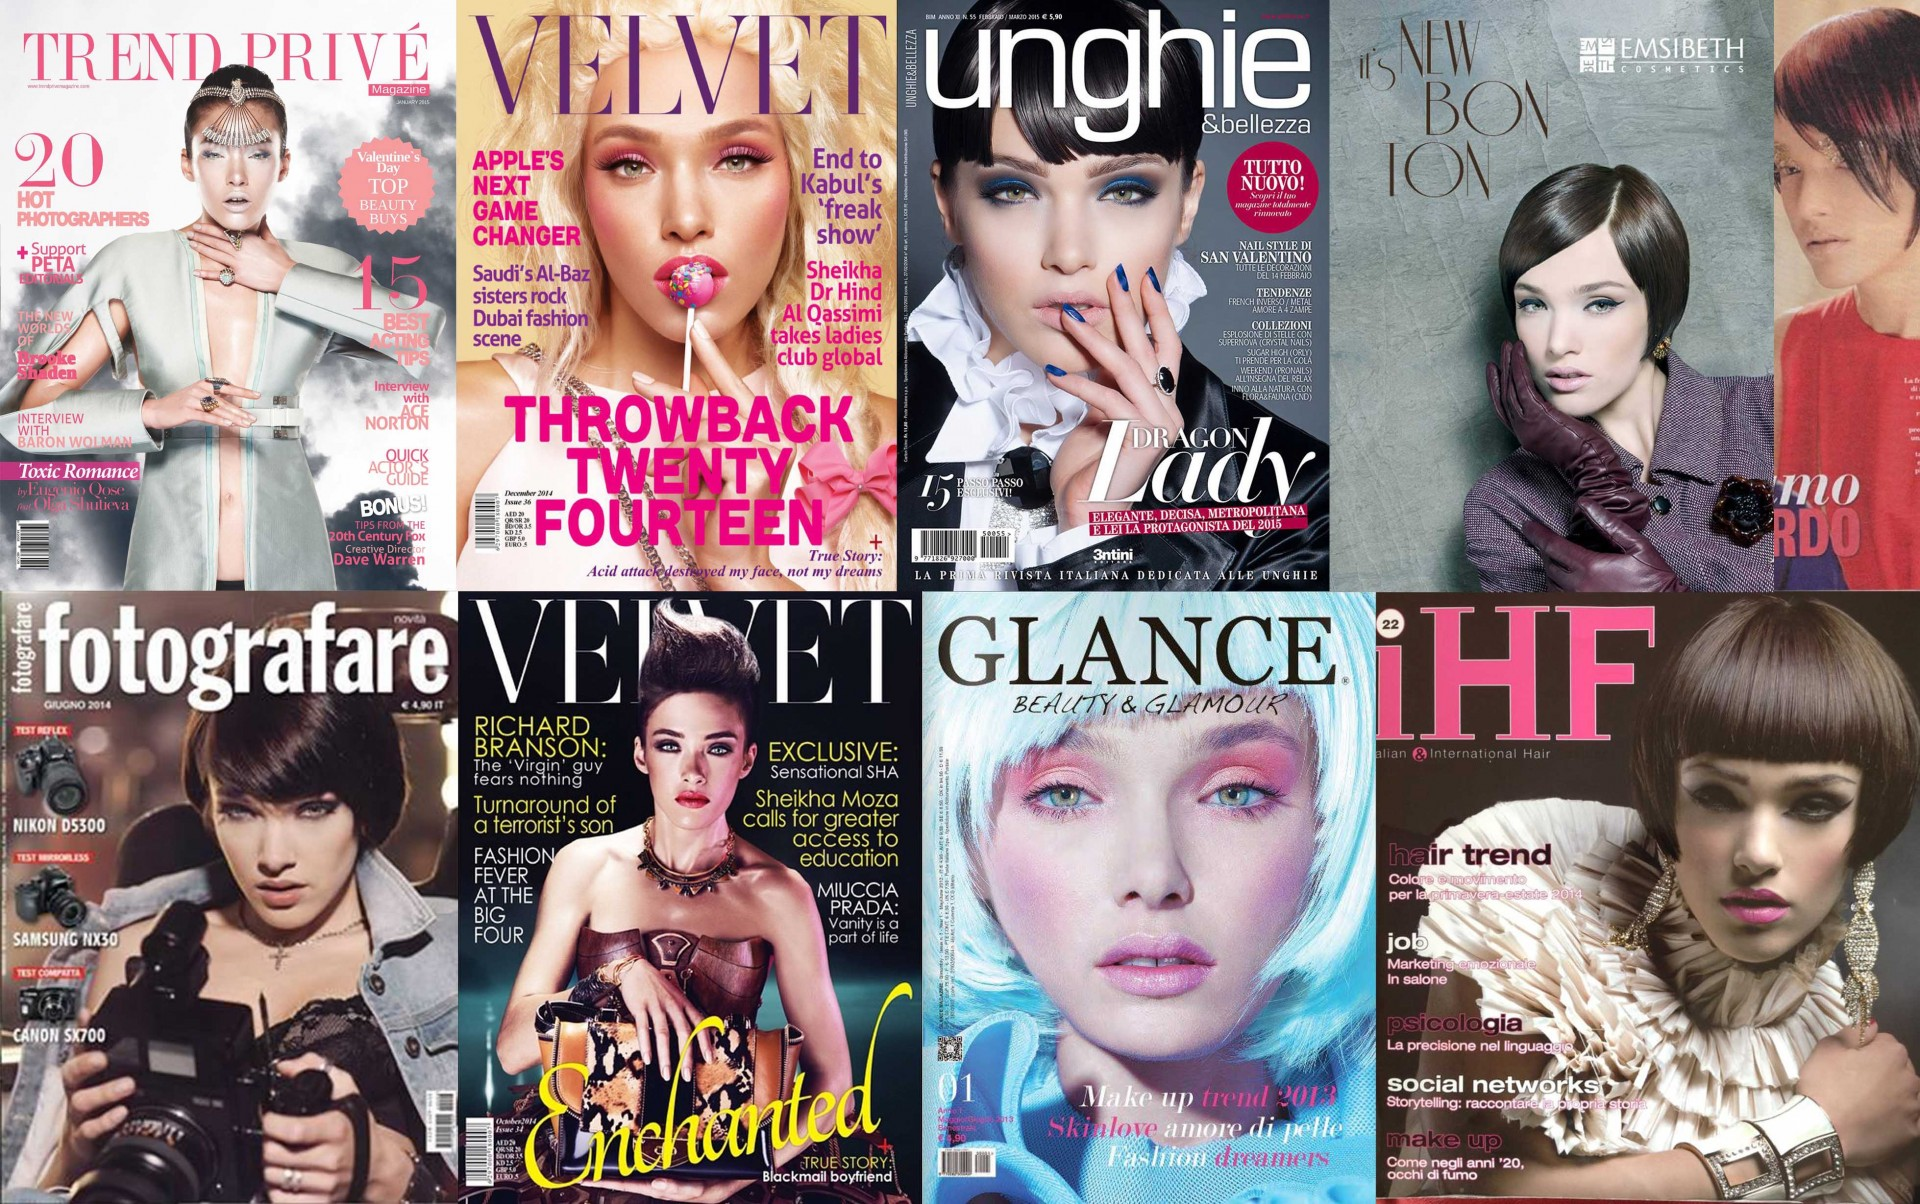 olga_shutieva_eugenio_qose_magazines